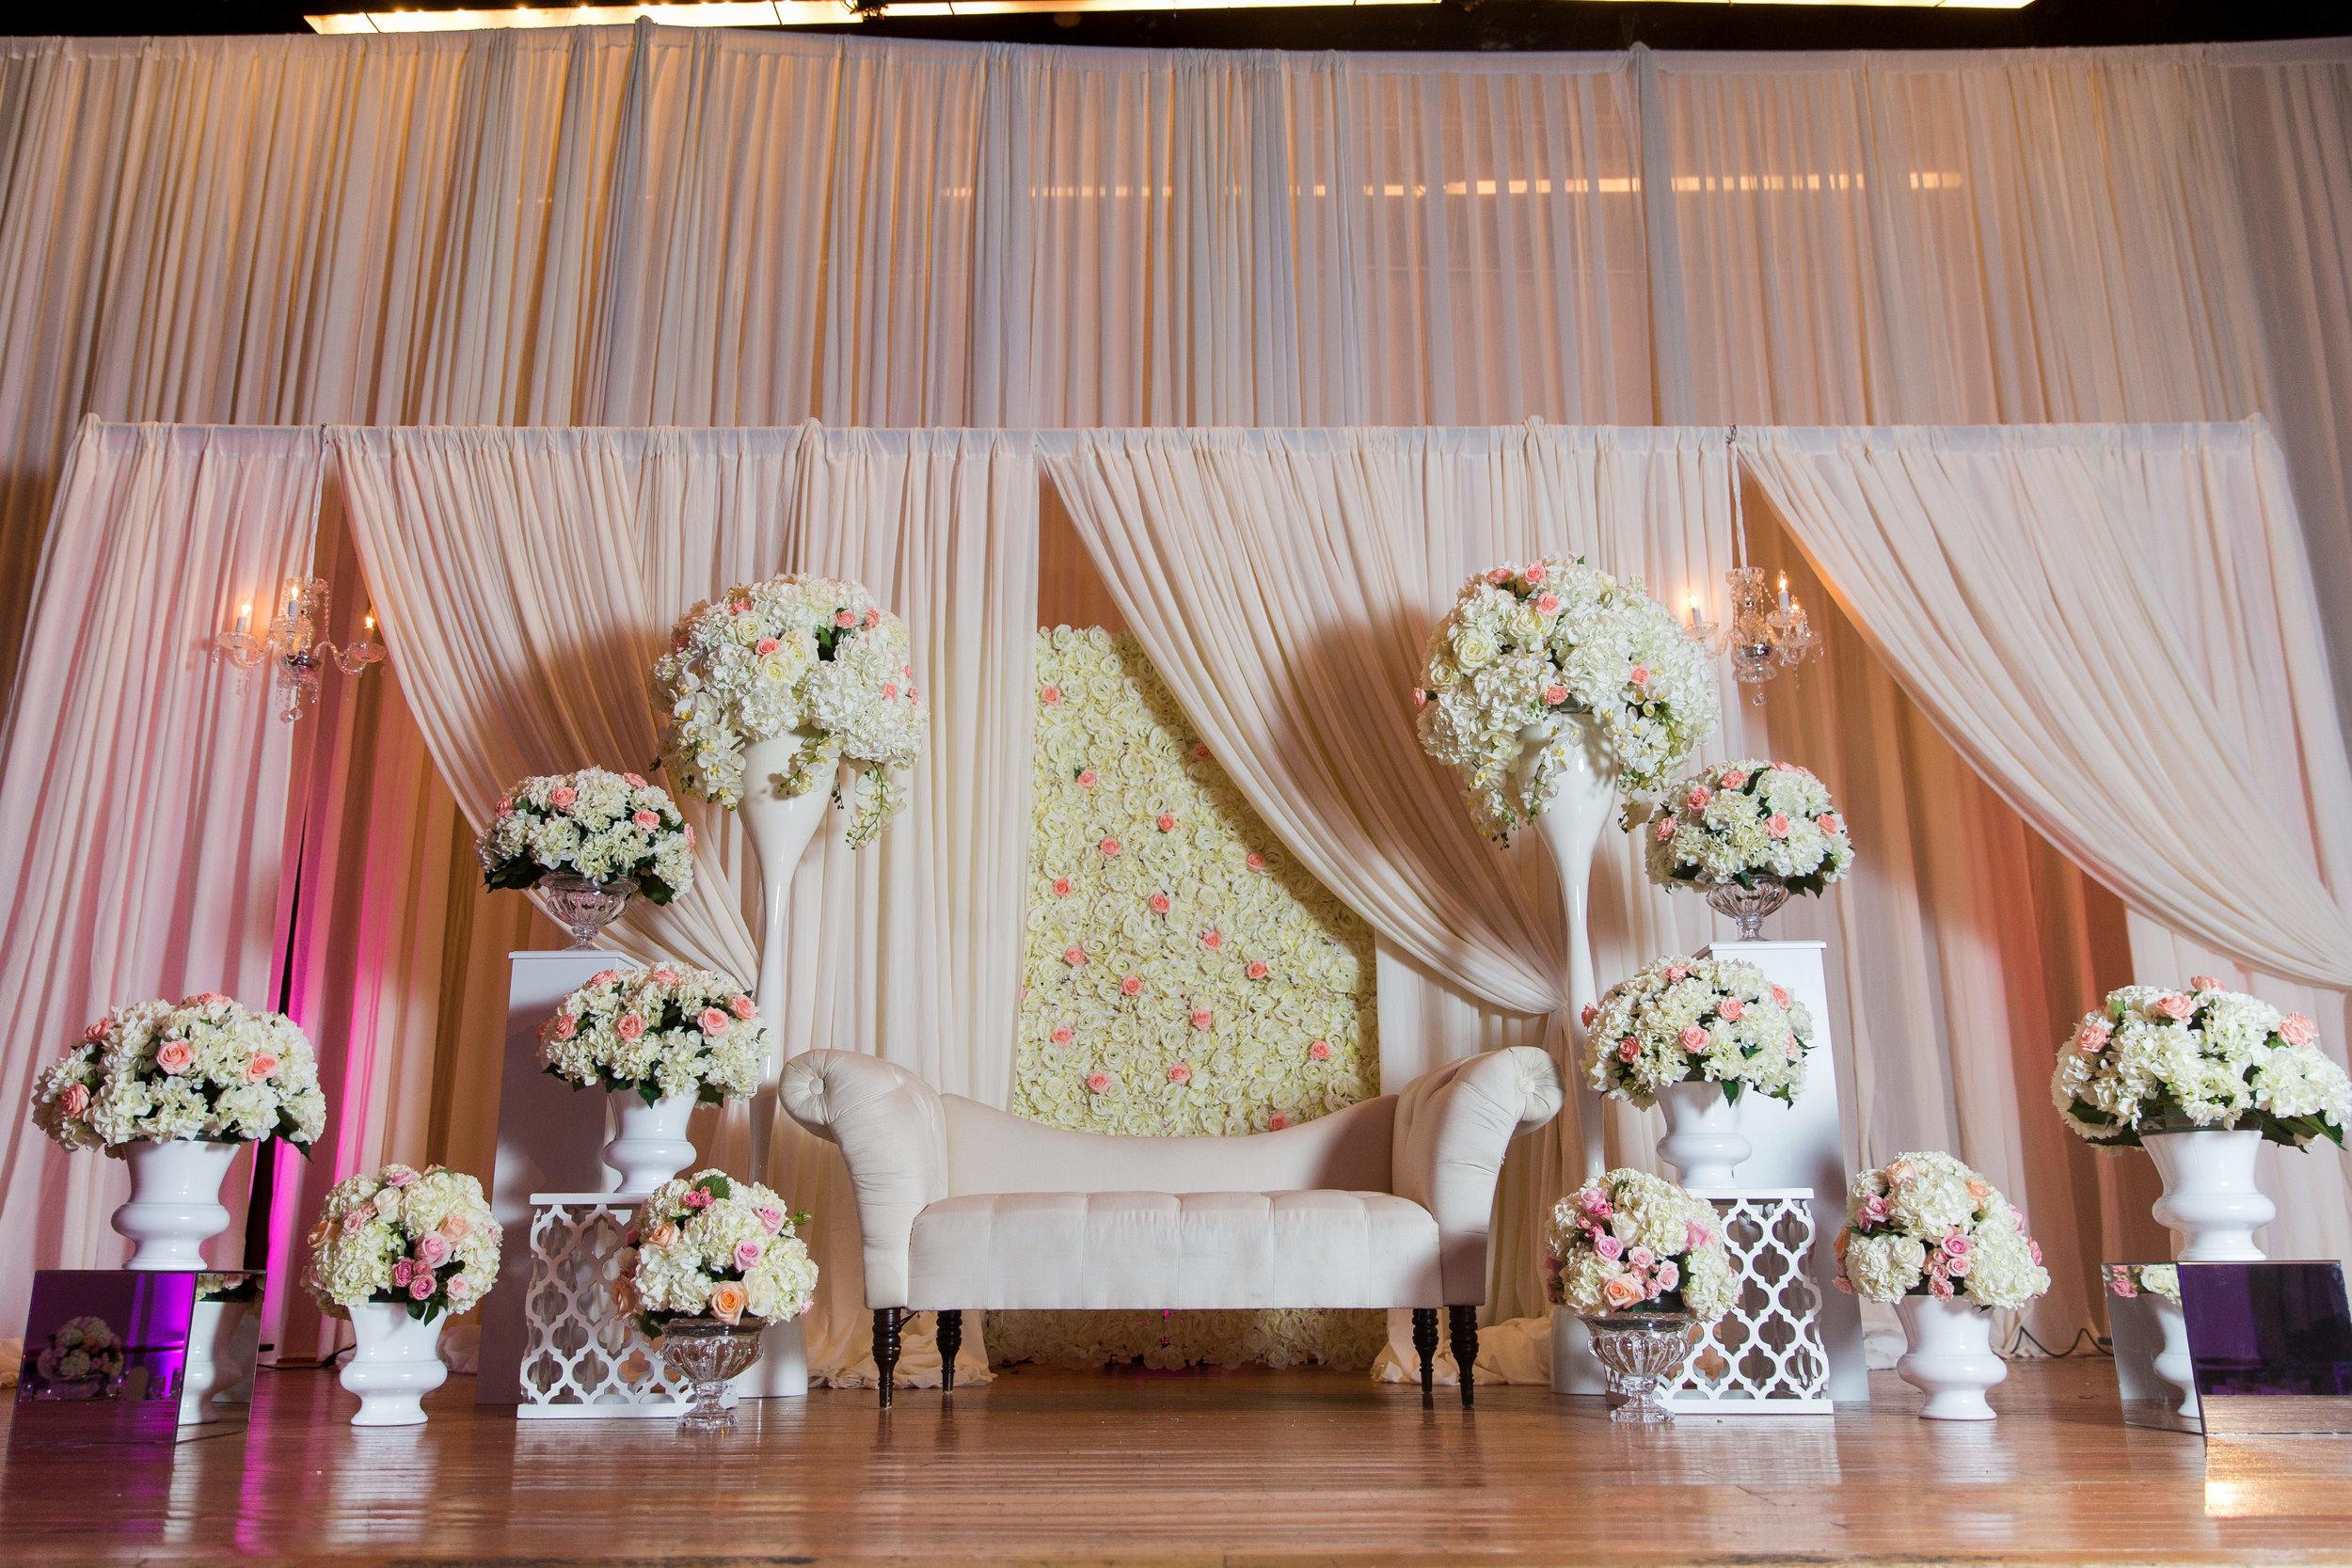 SJ_Wedding_Reception-1 - Copy.jpg